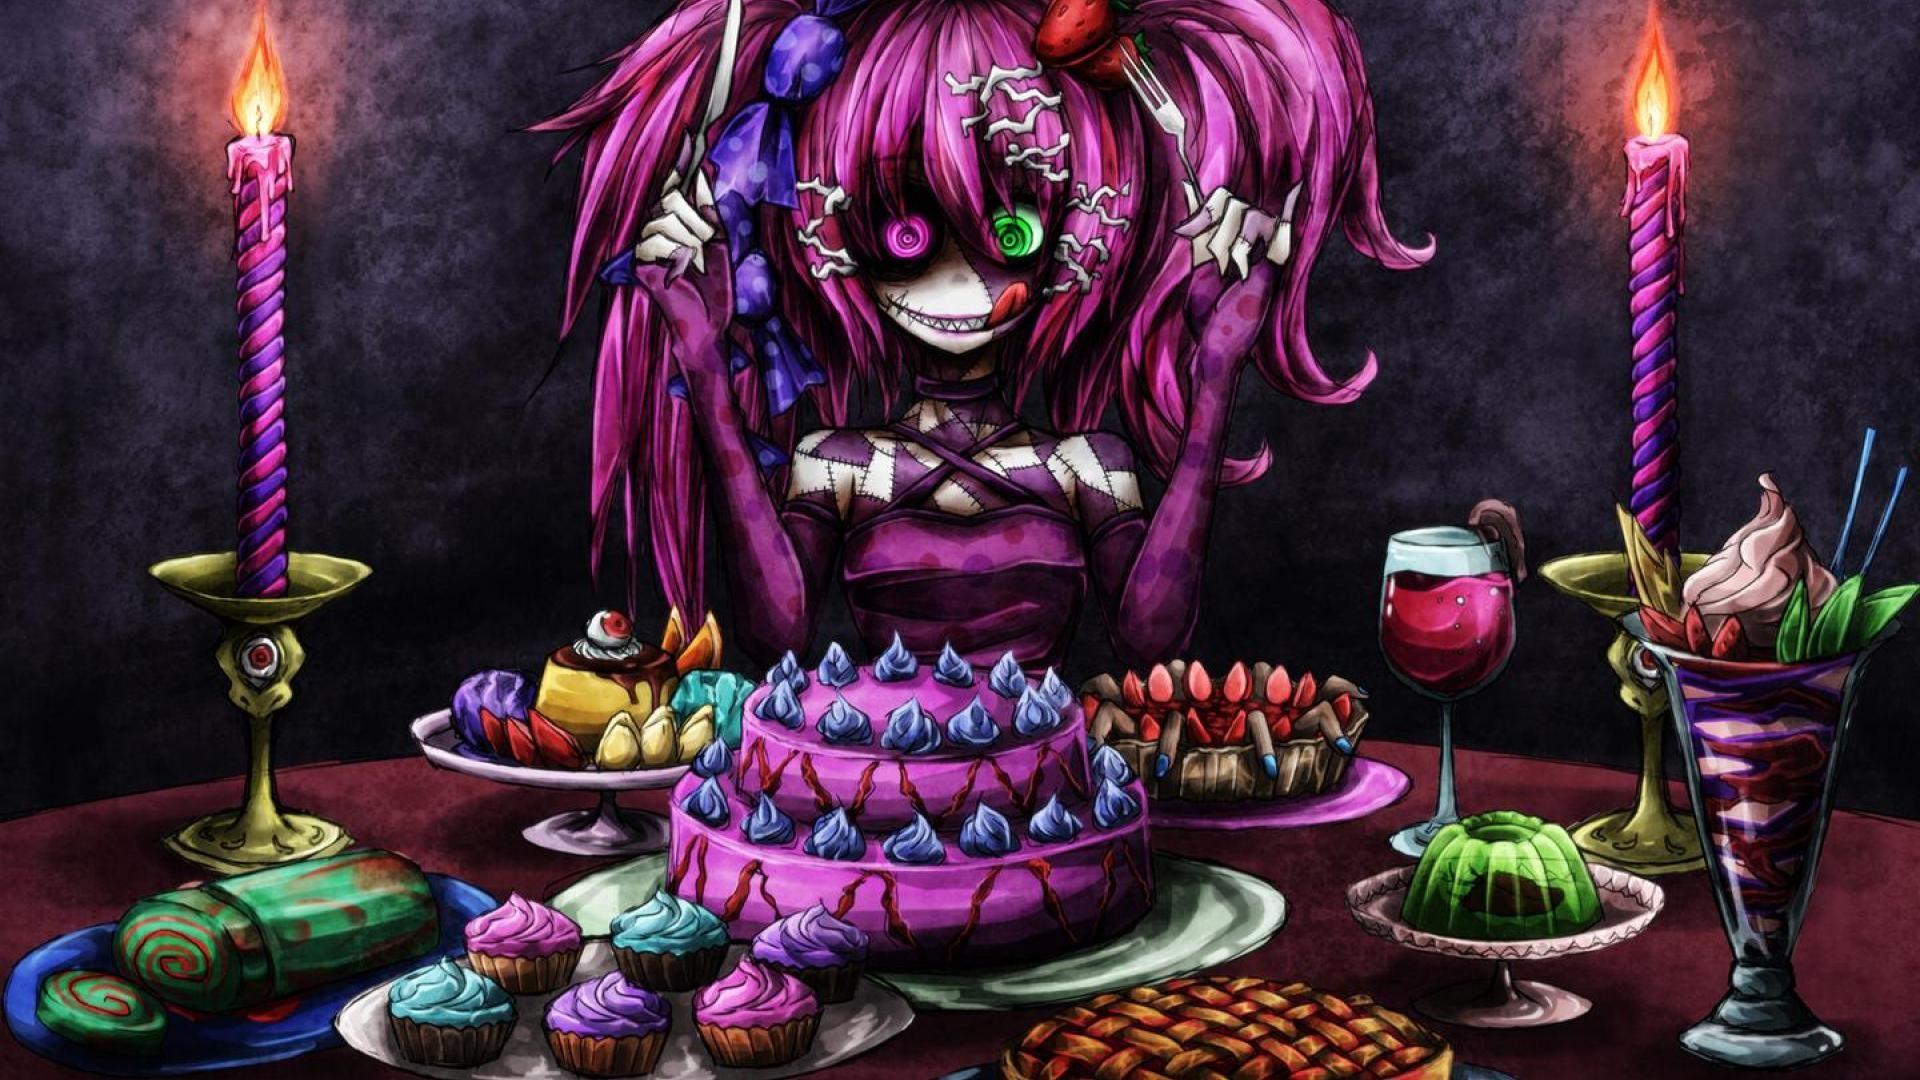 Pin By Robert Beltran On Anime Anime Halloween Anime Vocaloid Halloween anime wallpaper hd